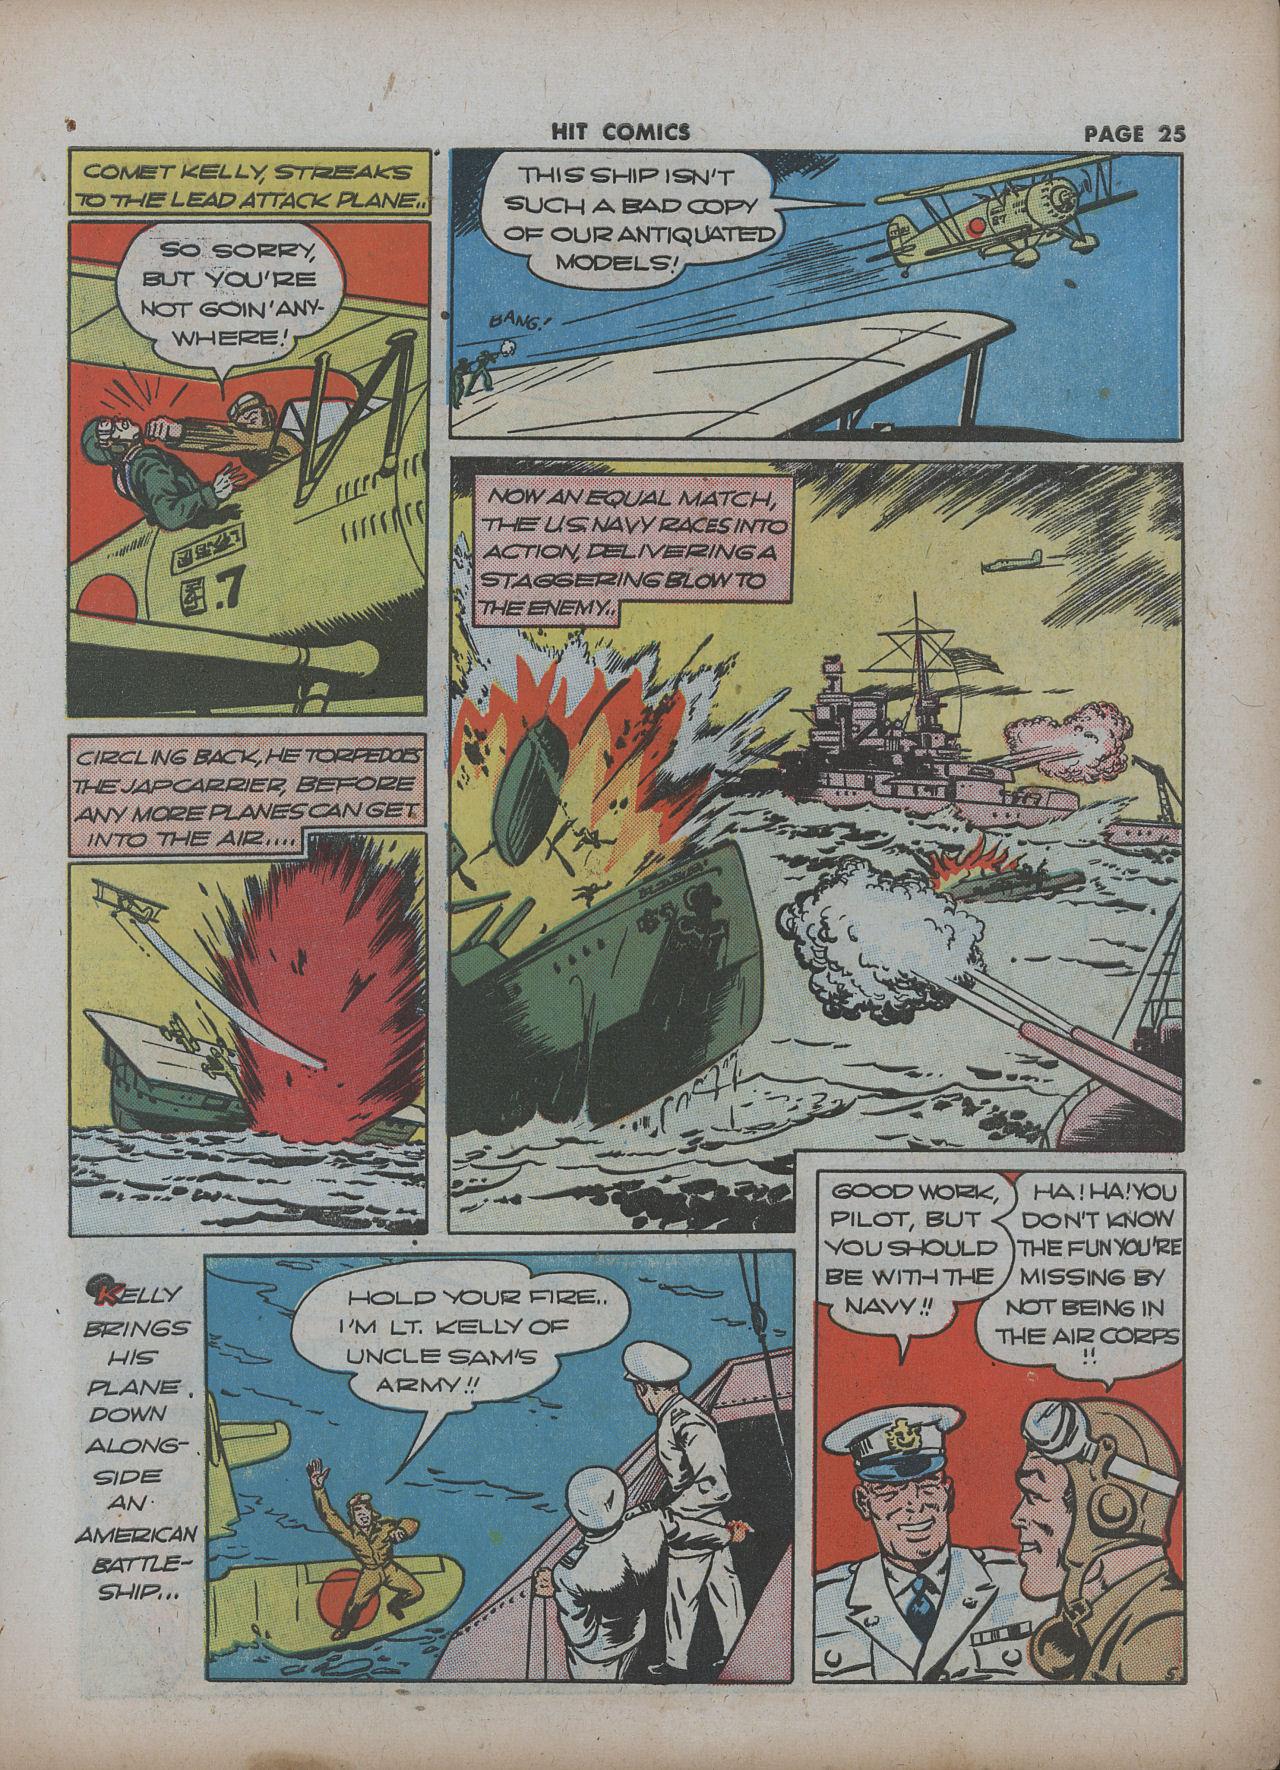 Read online Hit Comics comic -  Issue #22 - 27